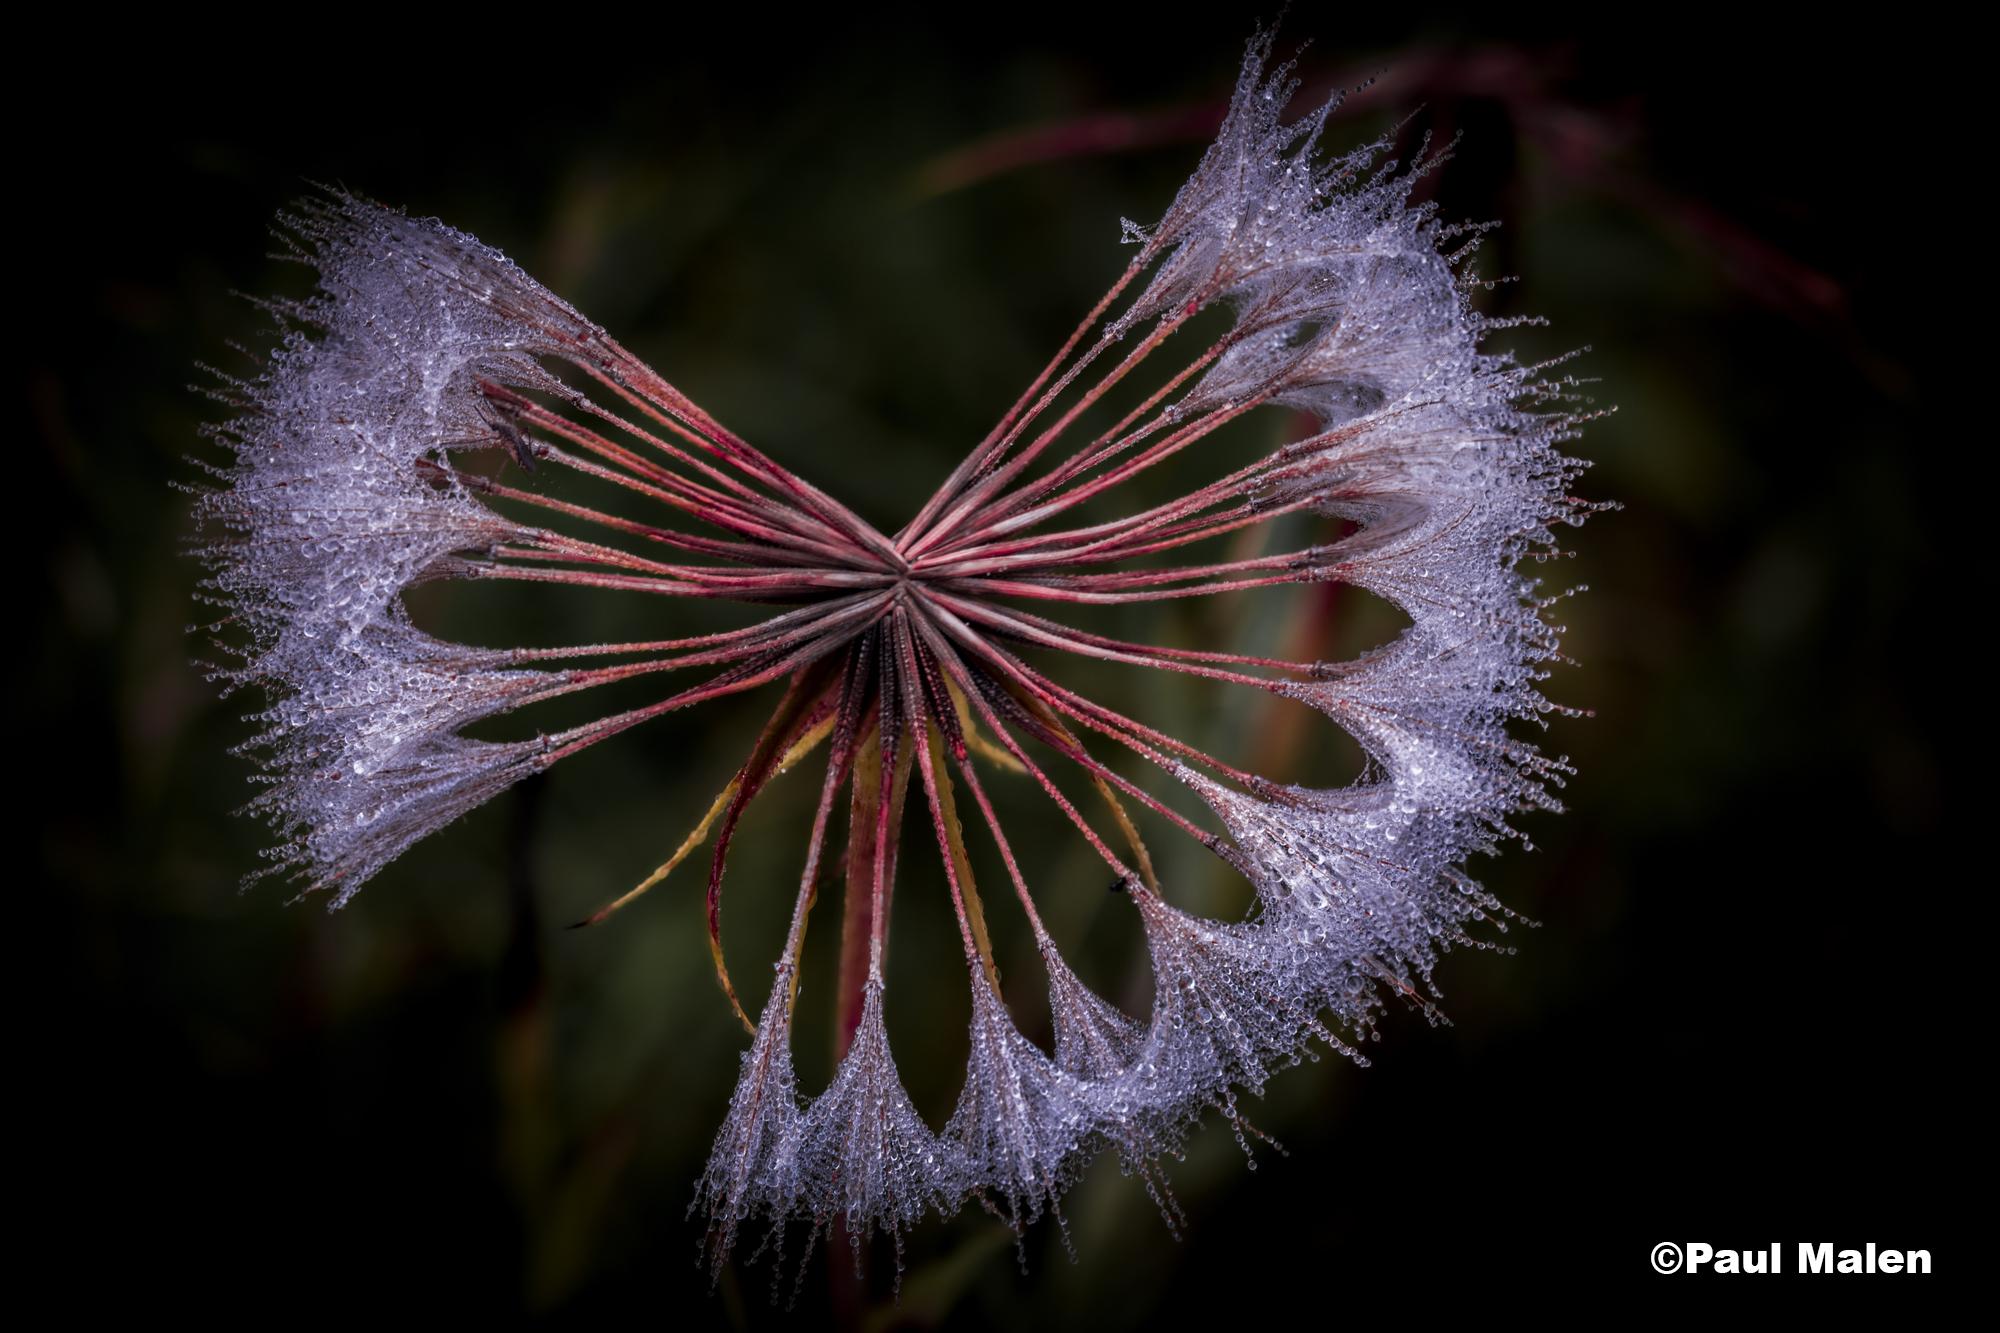 Dew on a dandelion against a dark background